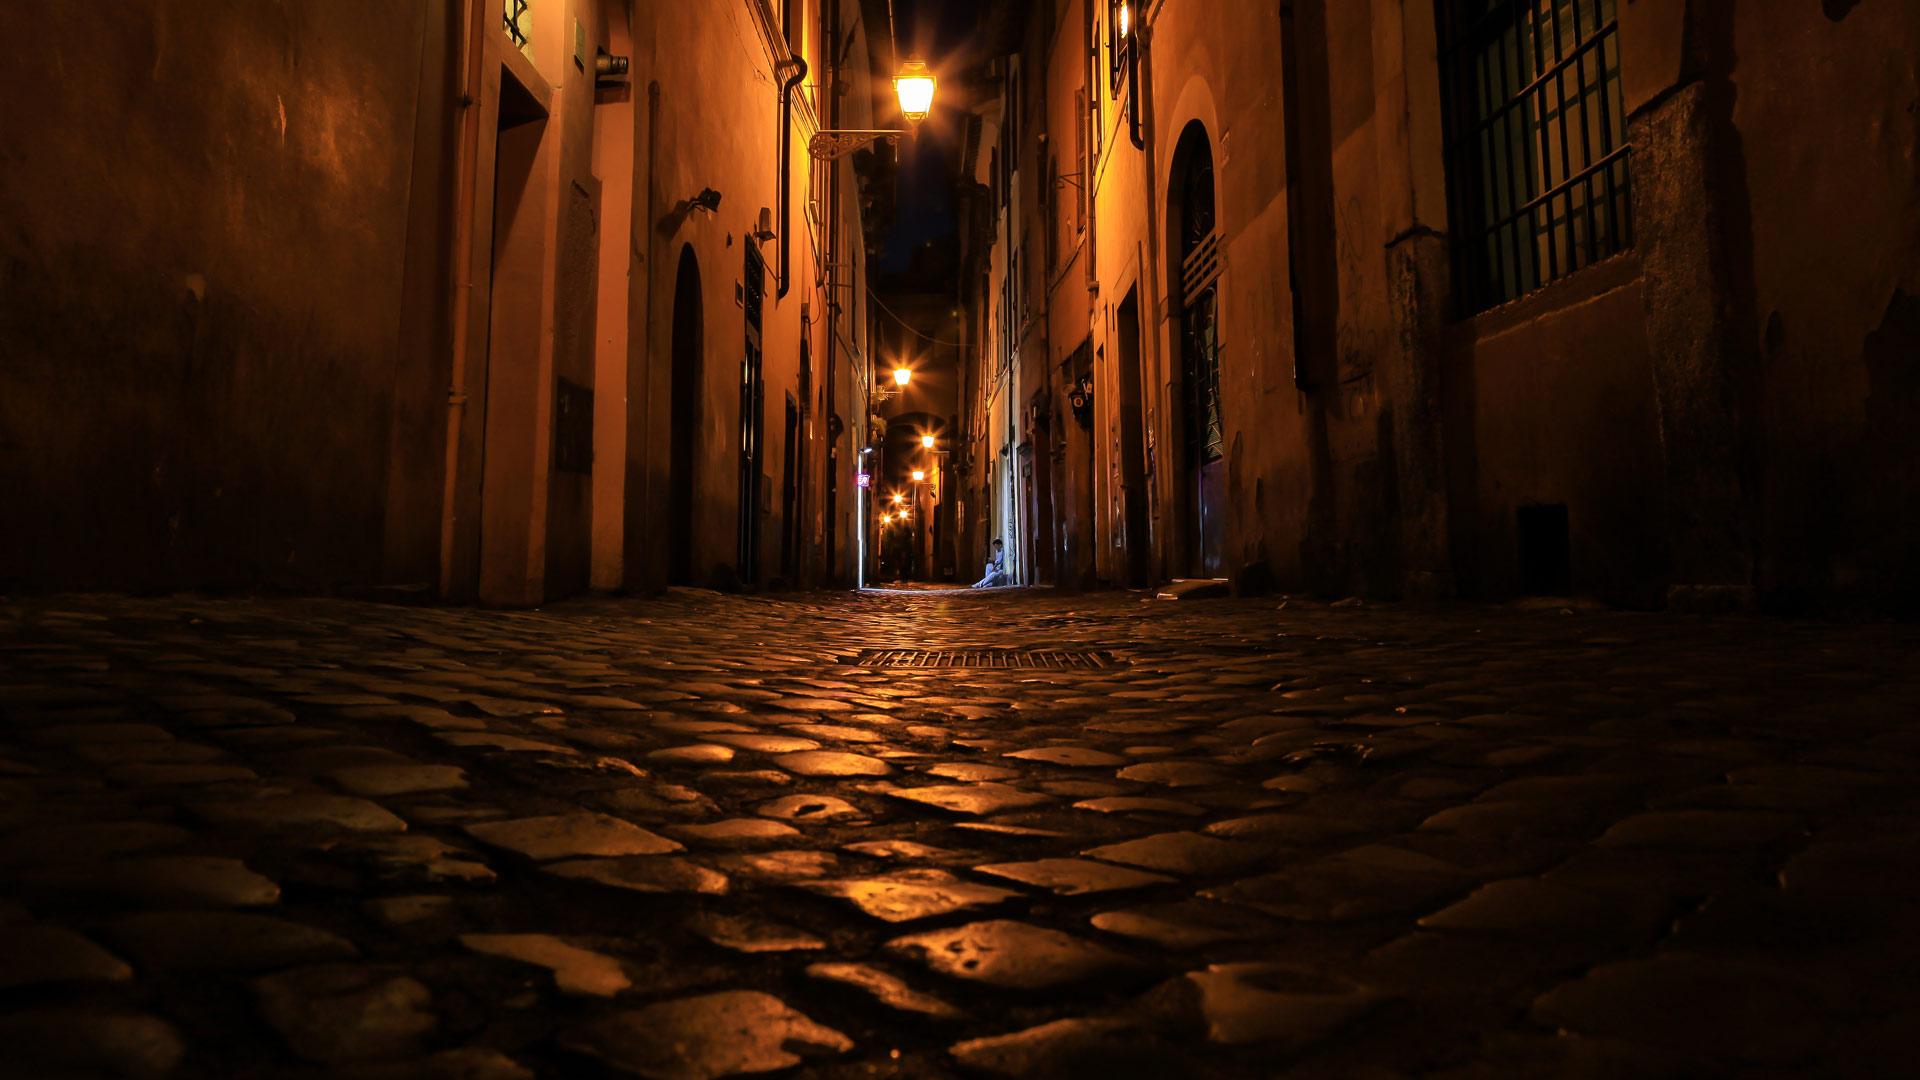 cobblestone back street at night